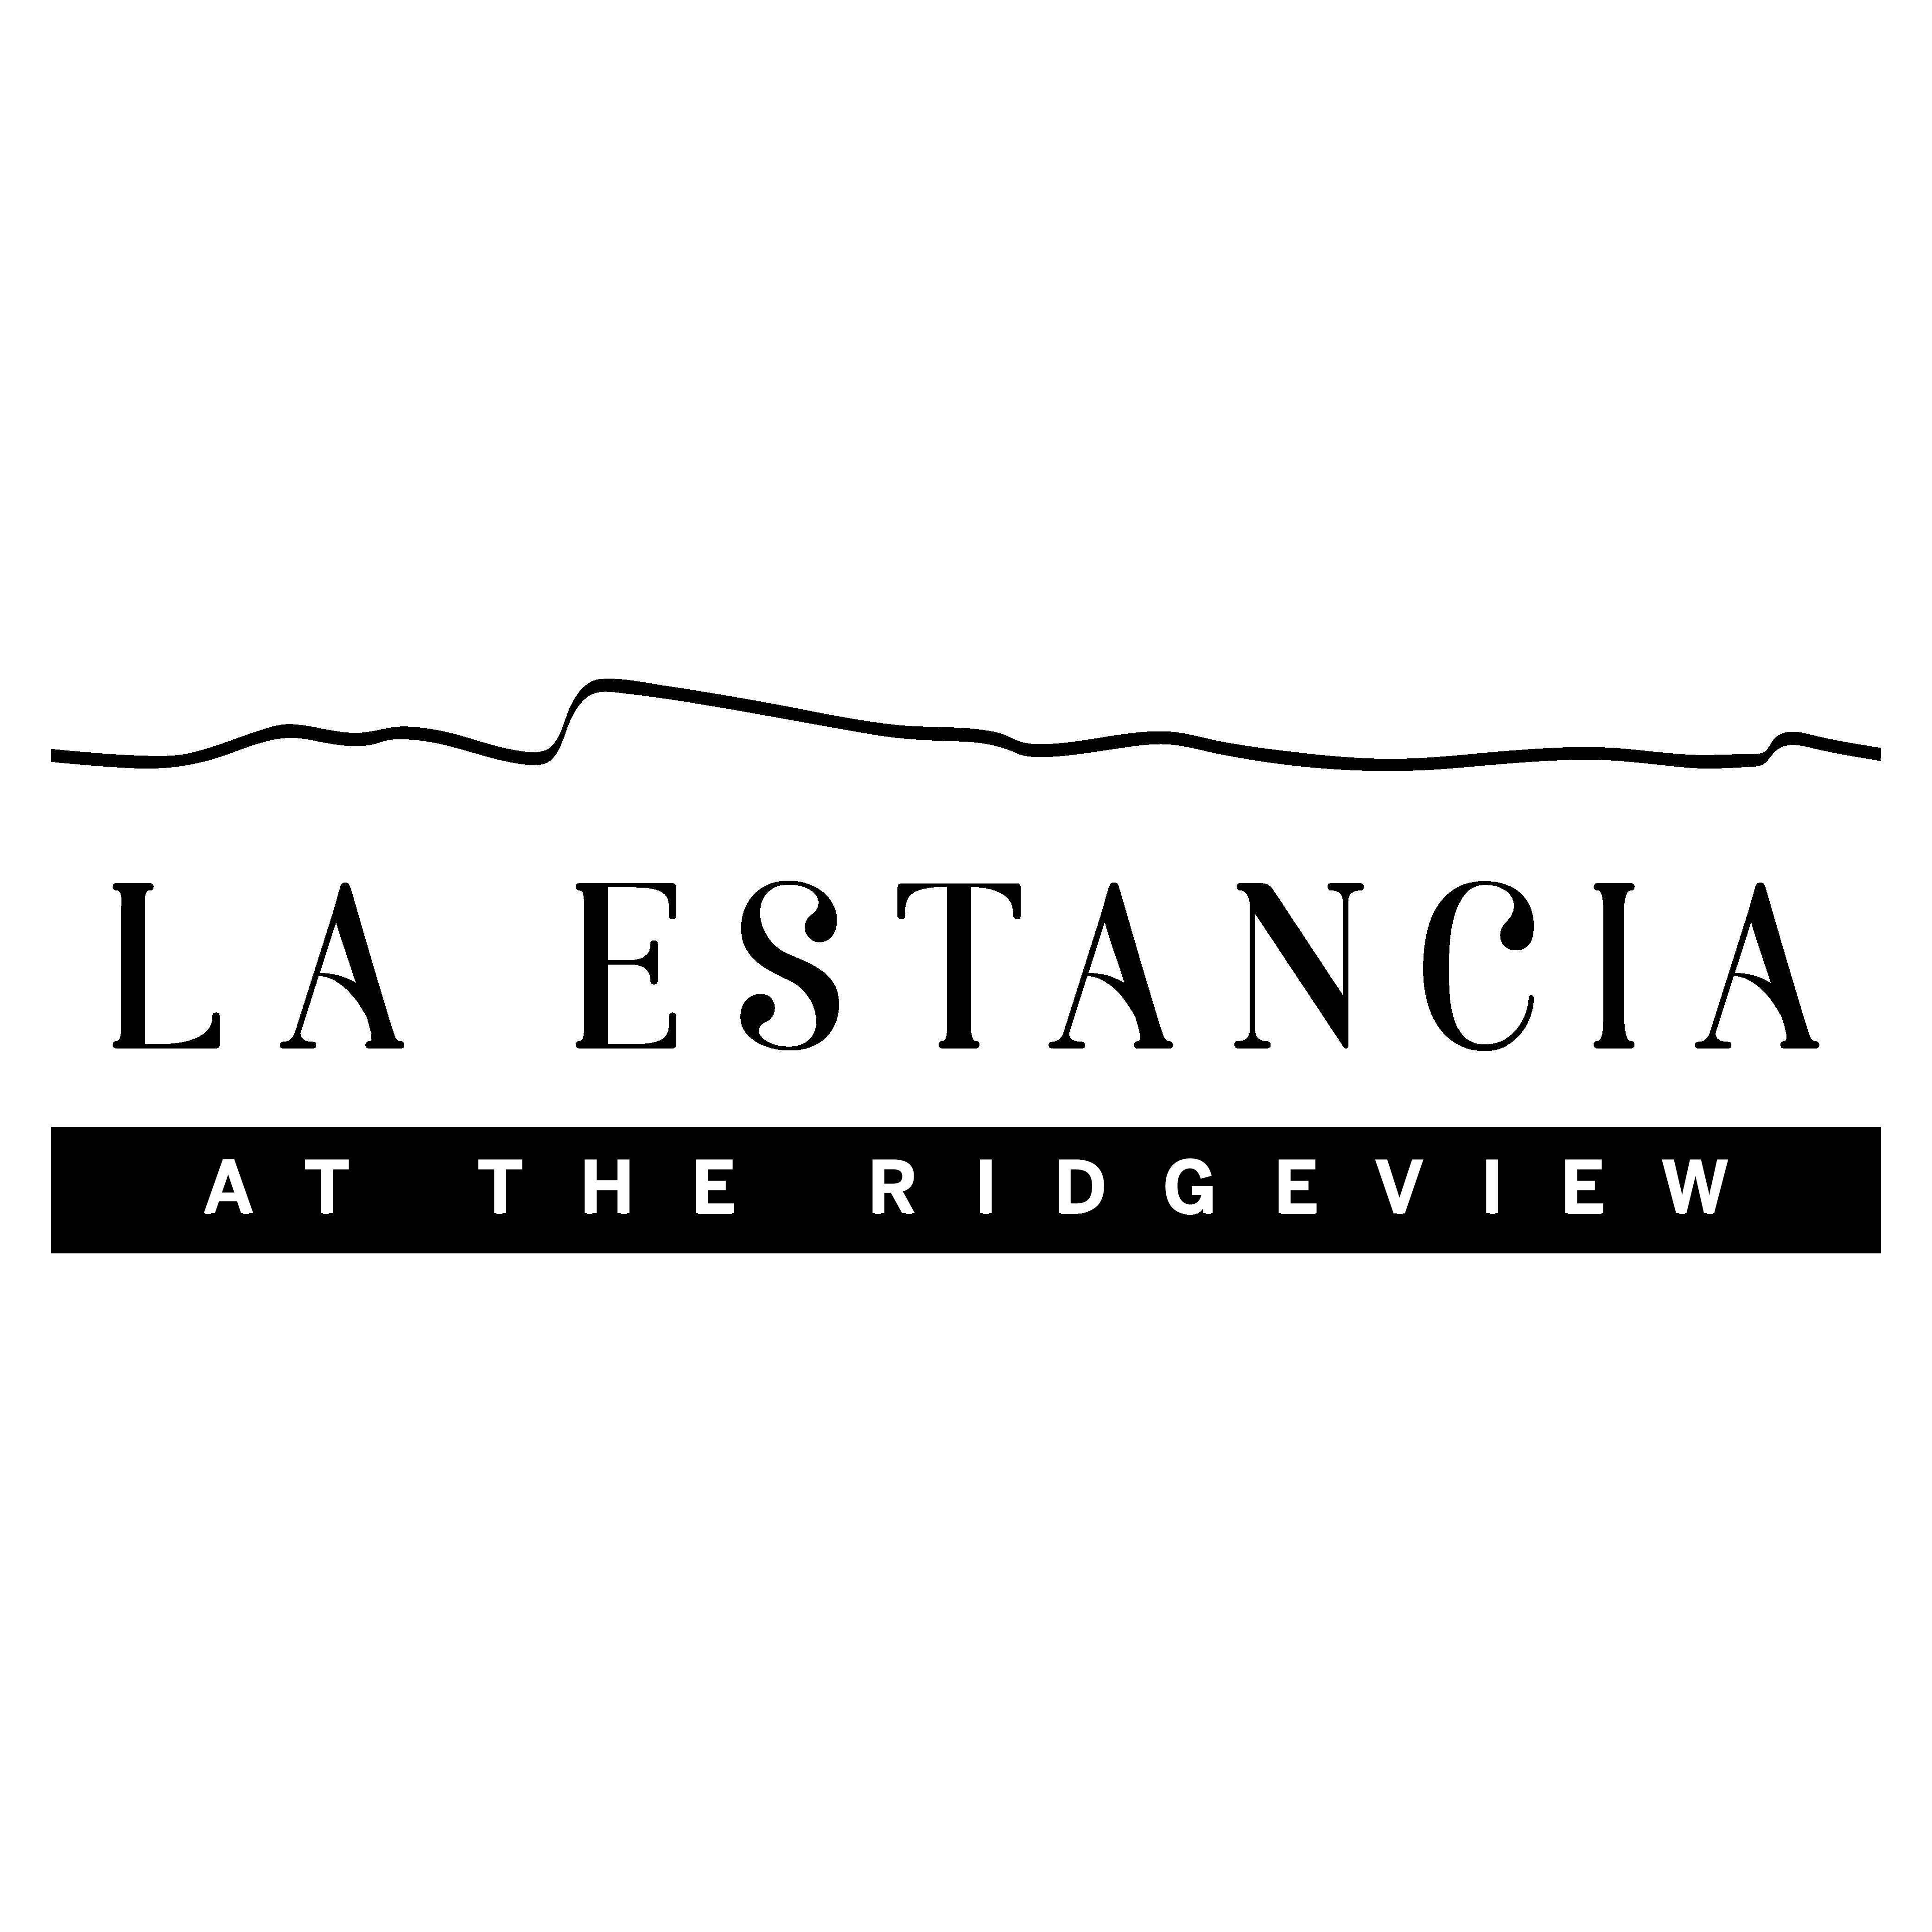 La Estancia at the Ridgeview logo